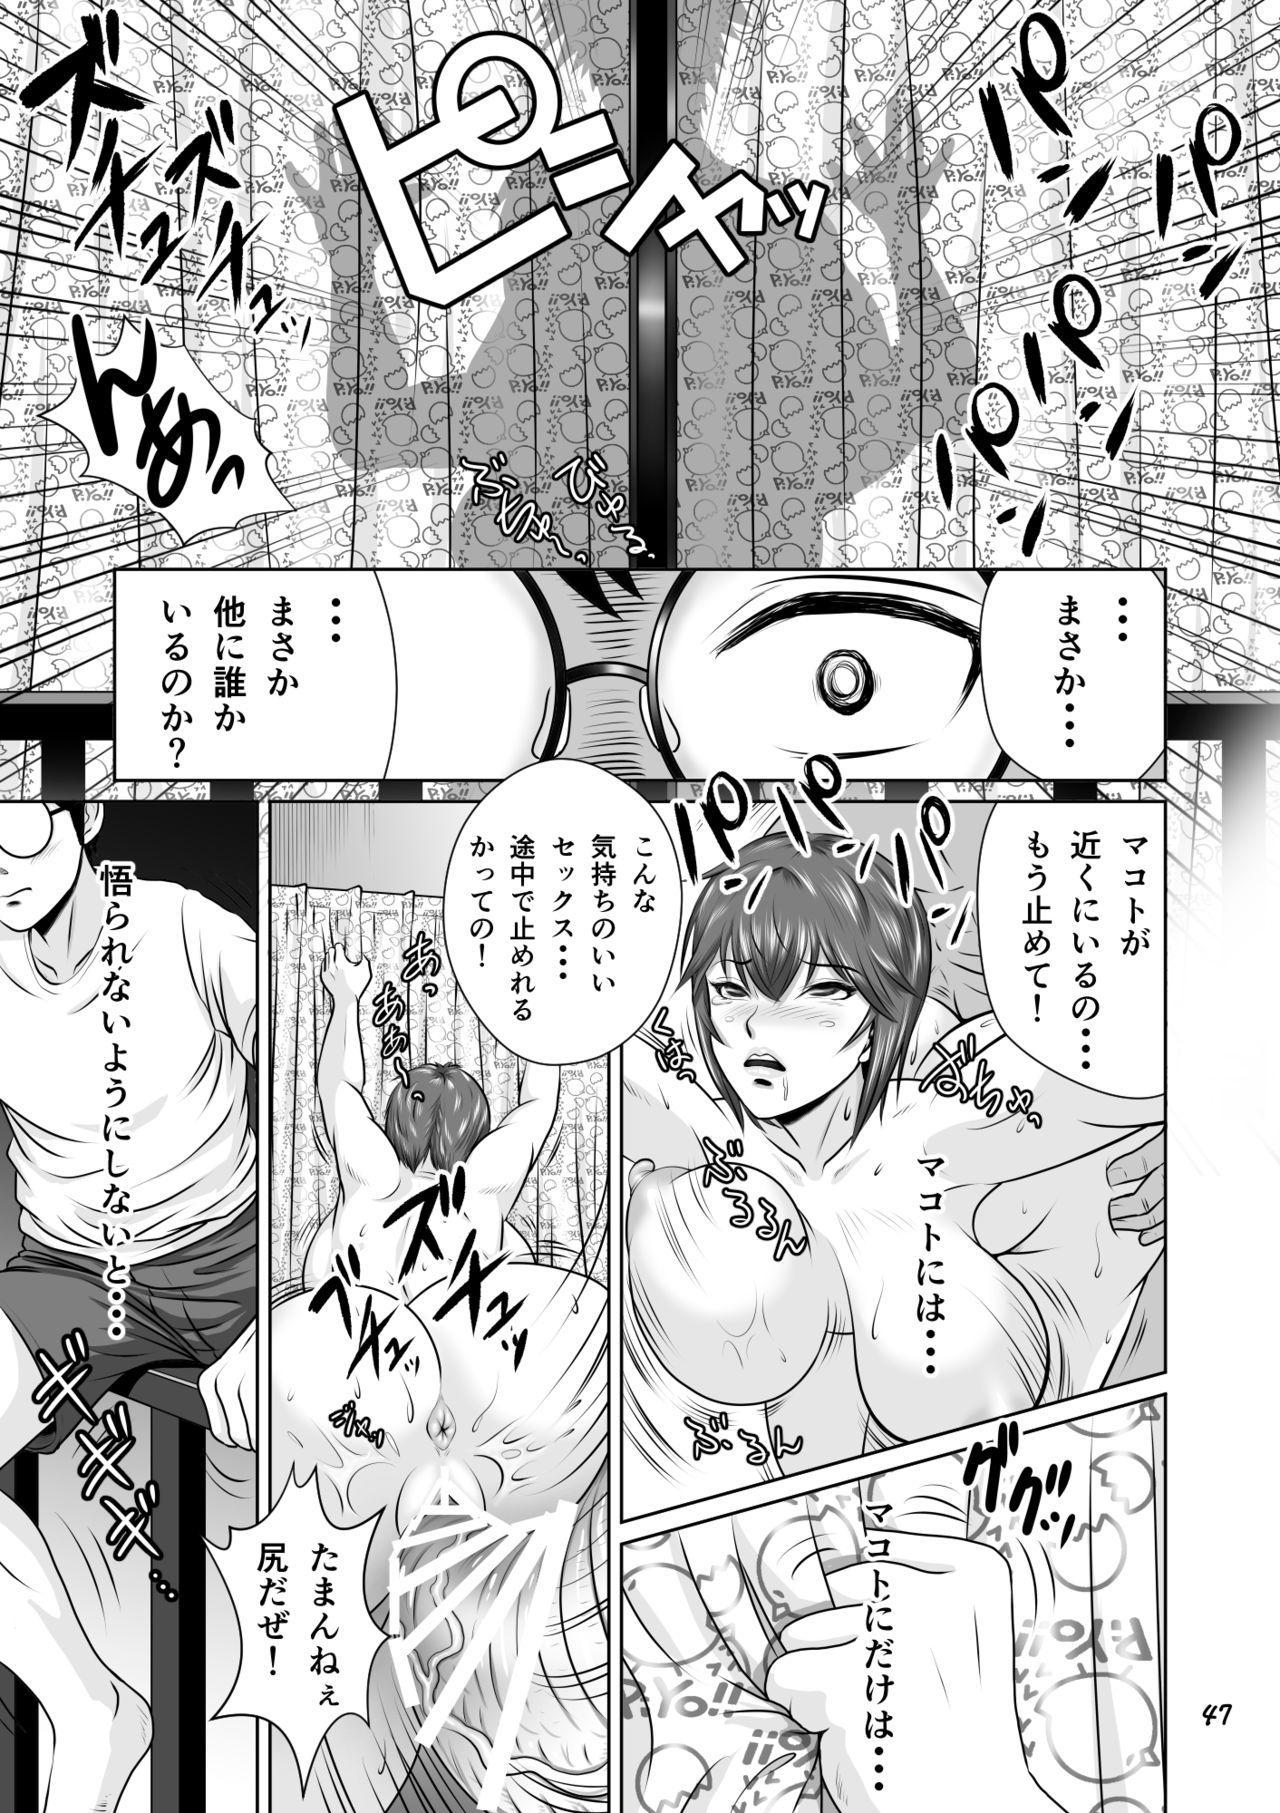 Netorare Osananajimi Haruka-chan Kiki Ippatsu!! 47